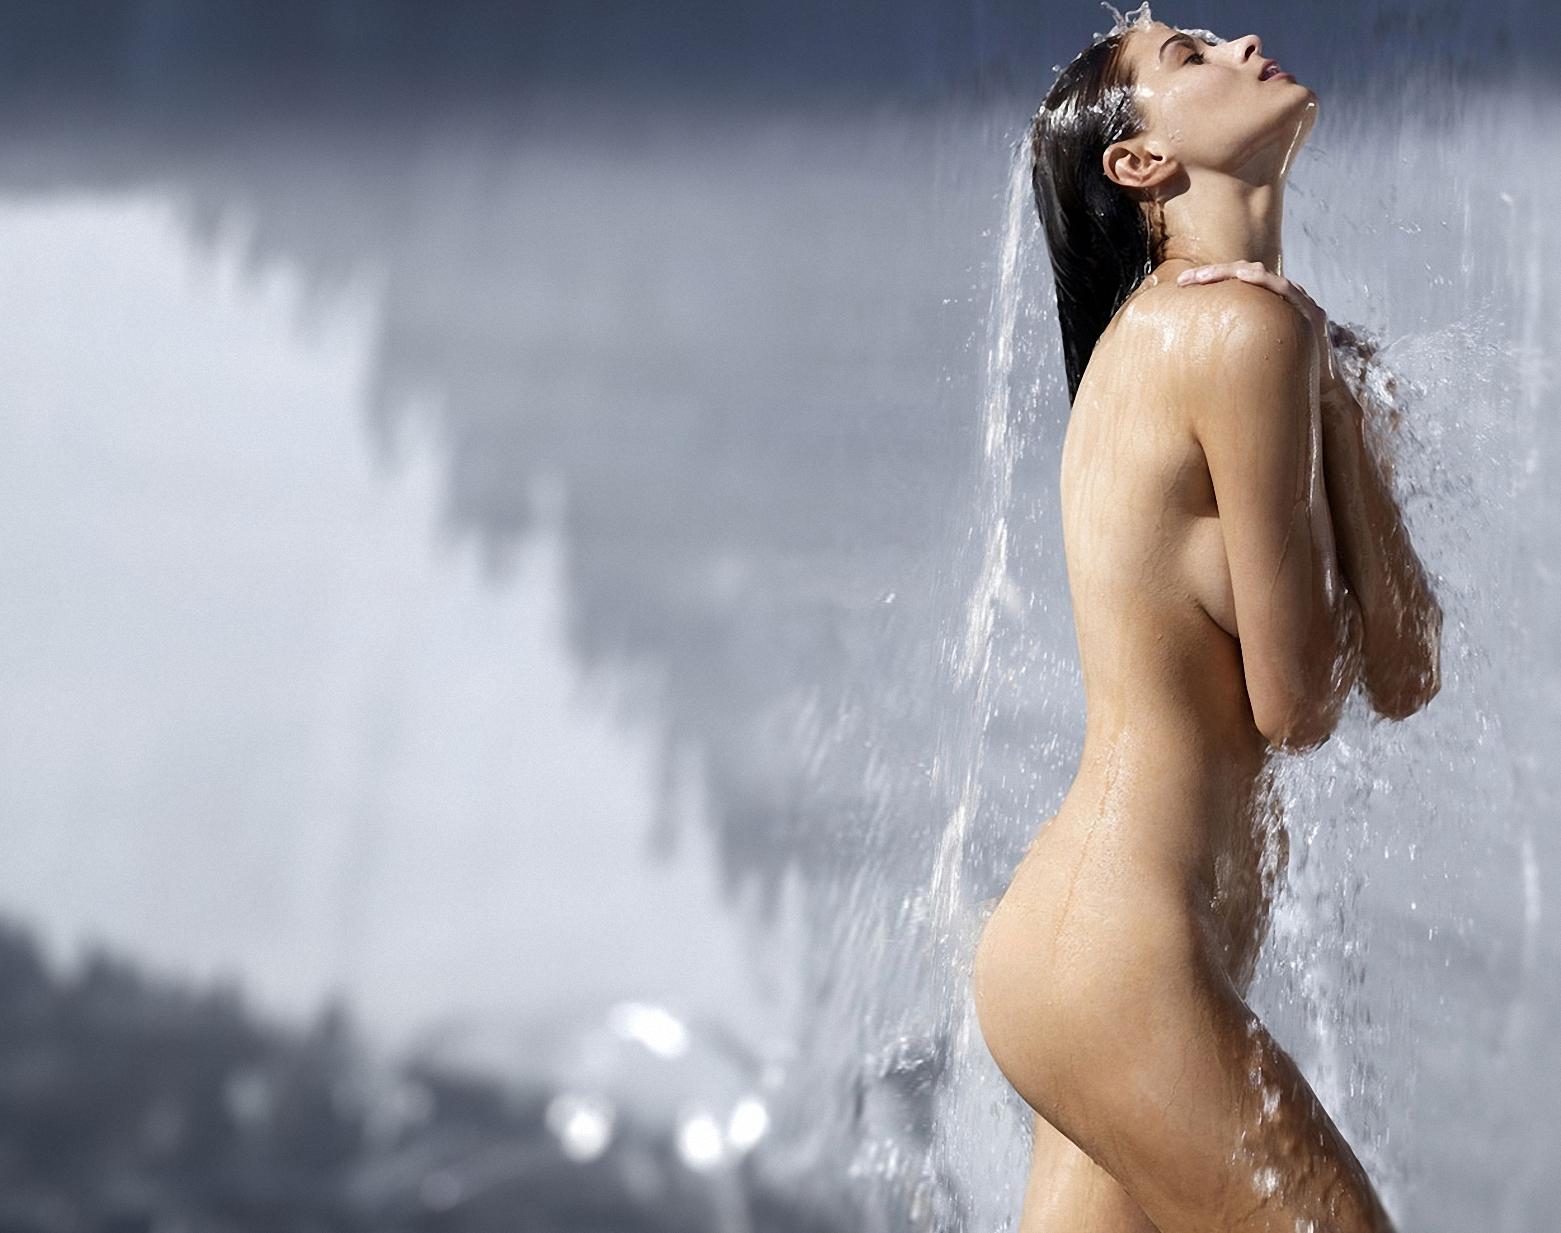 Wet bikini female enjoying outdoor tropical shower